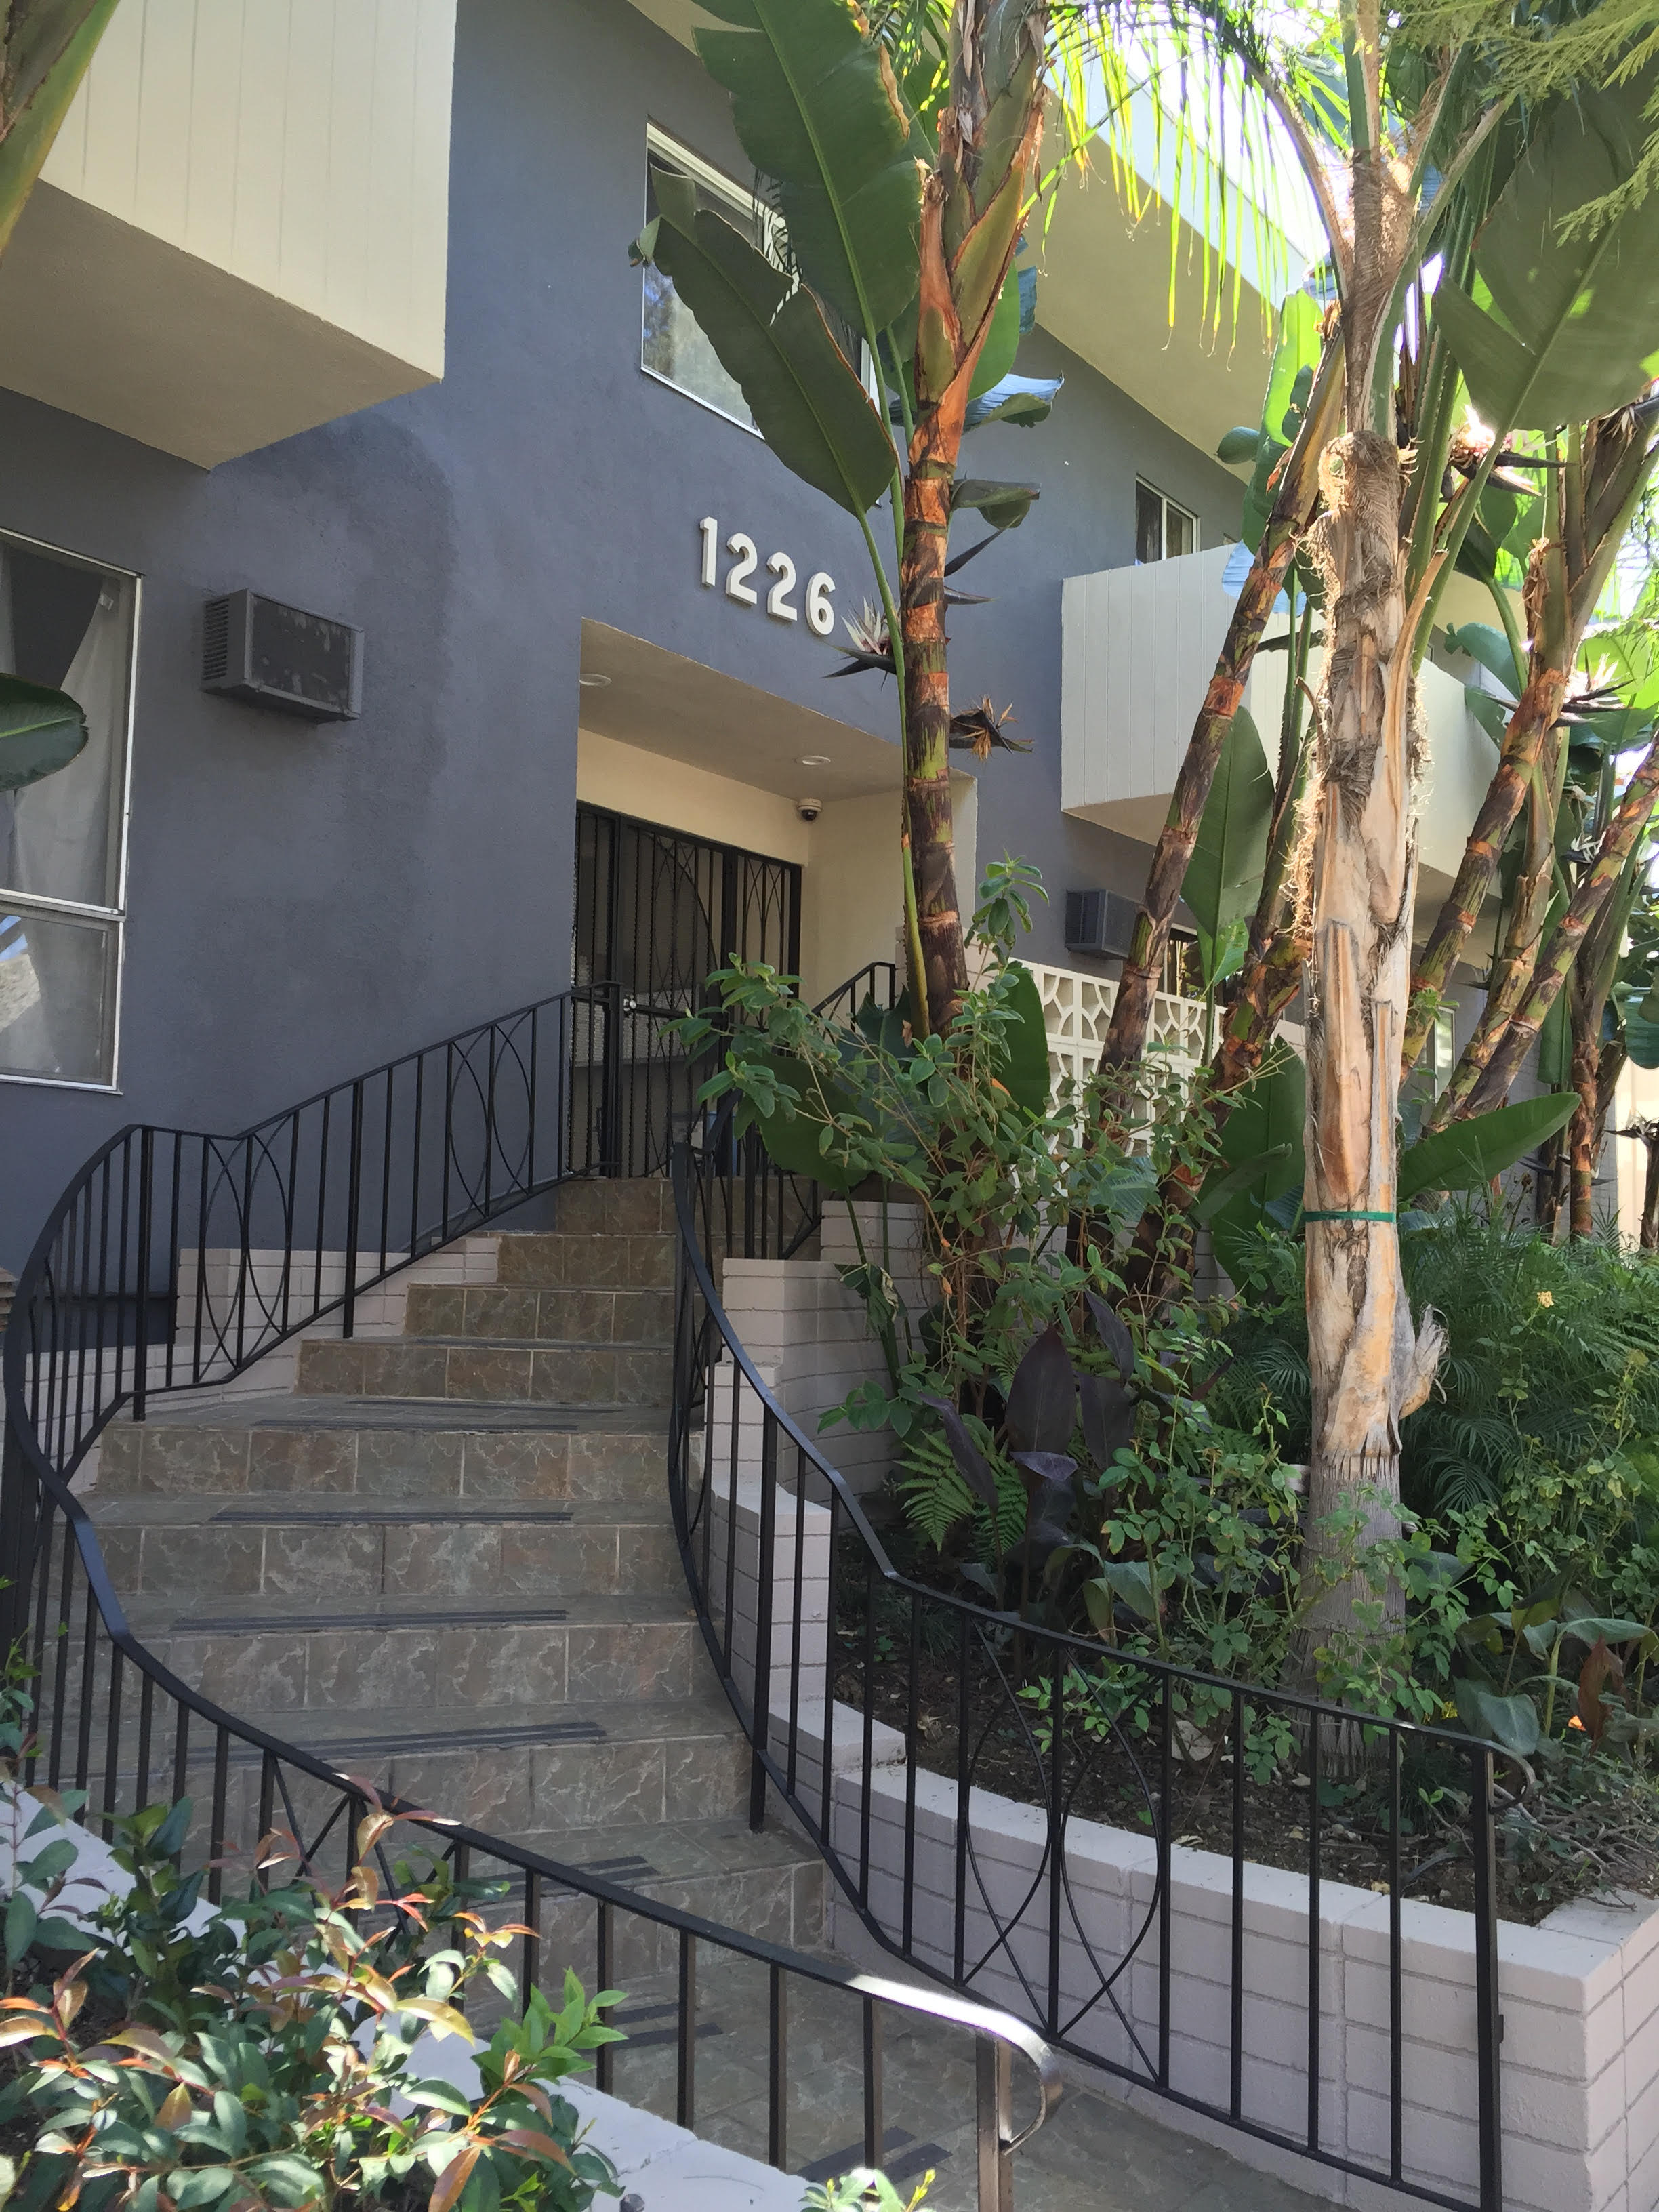 1226 N Fuller Ave., West Hollywood, CA 90046